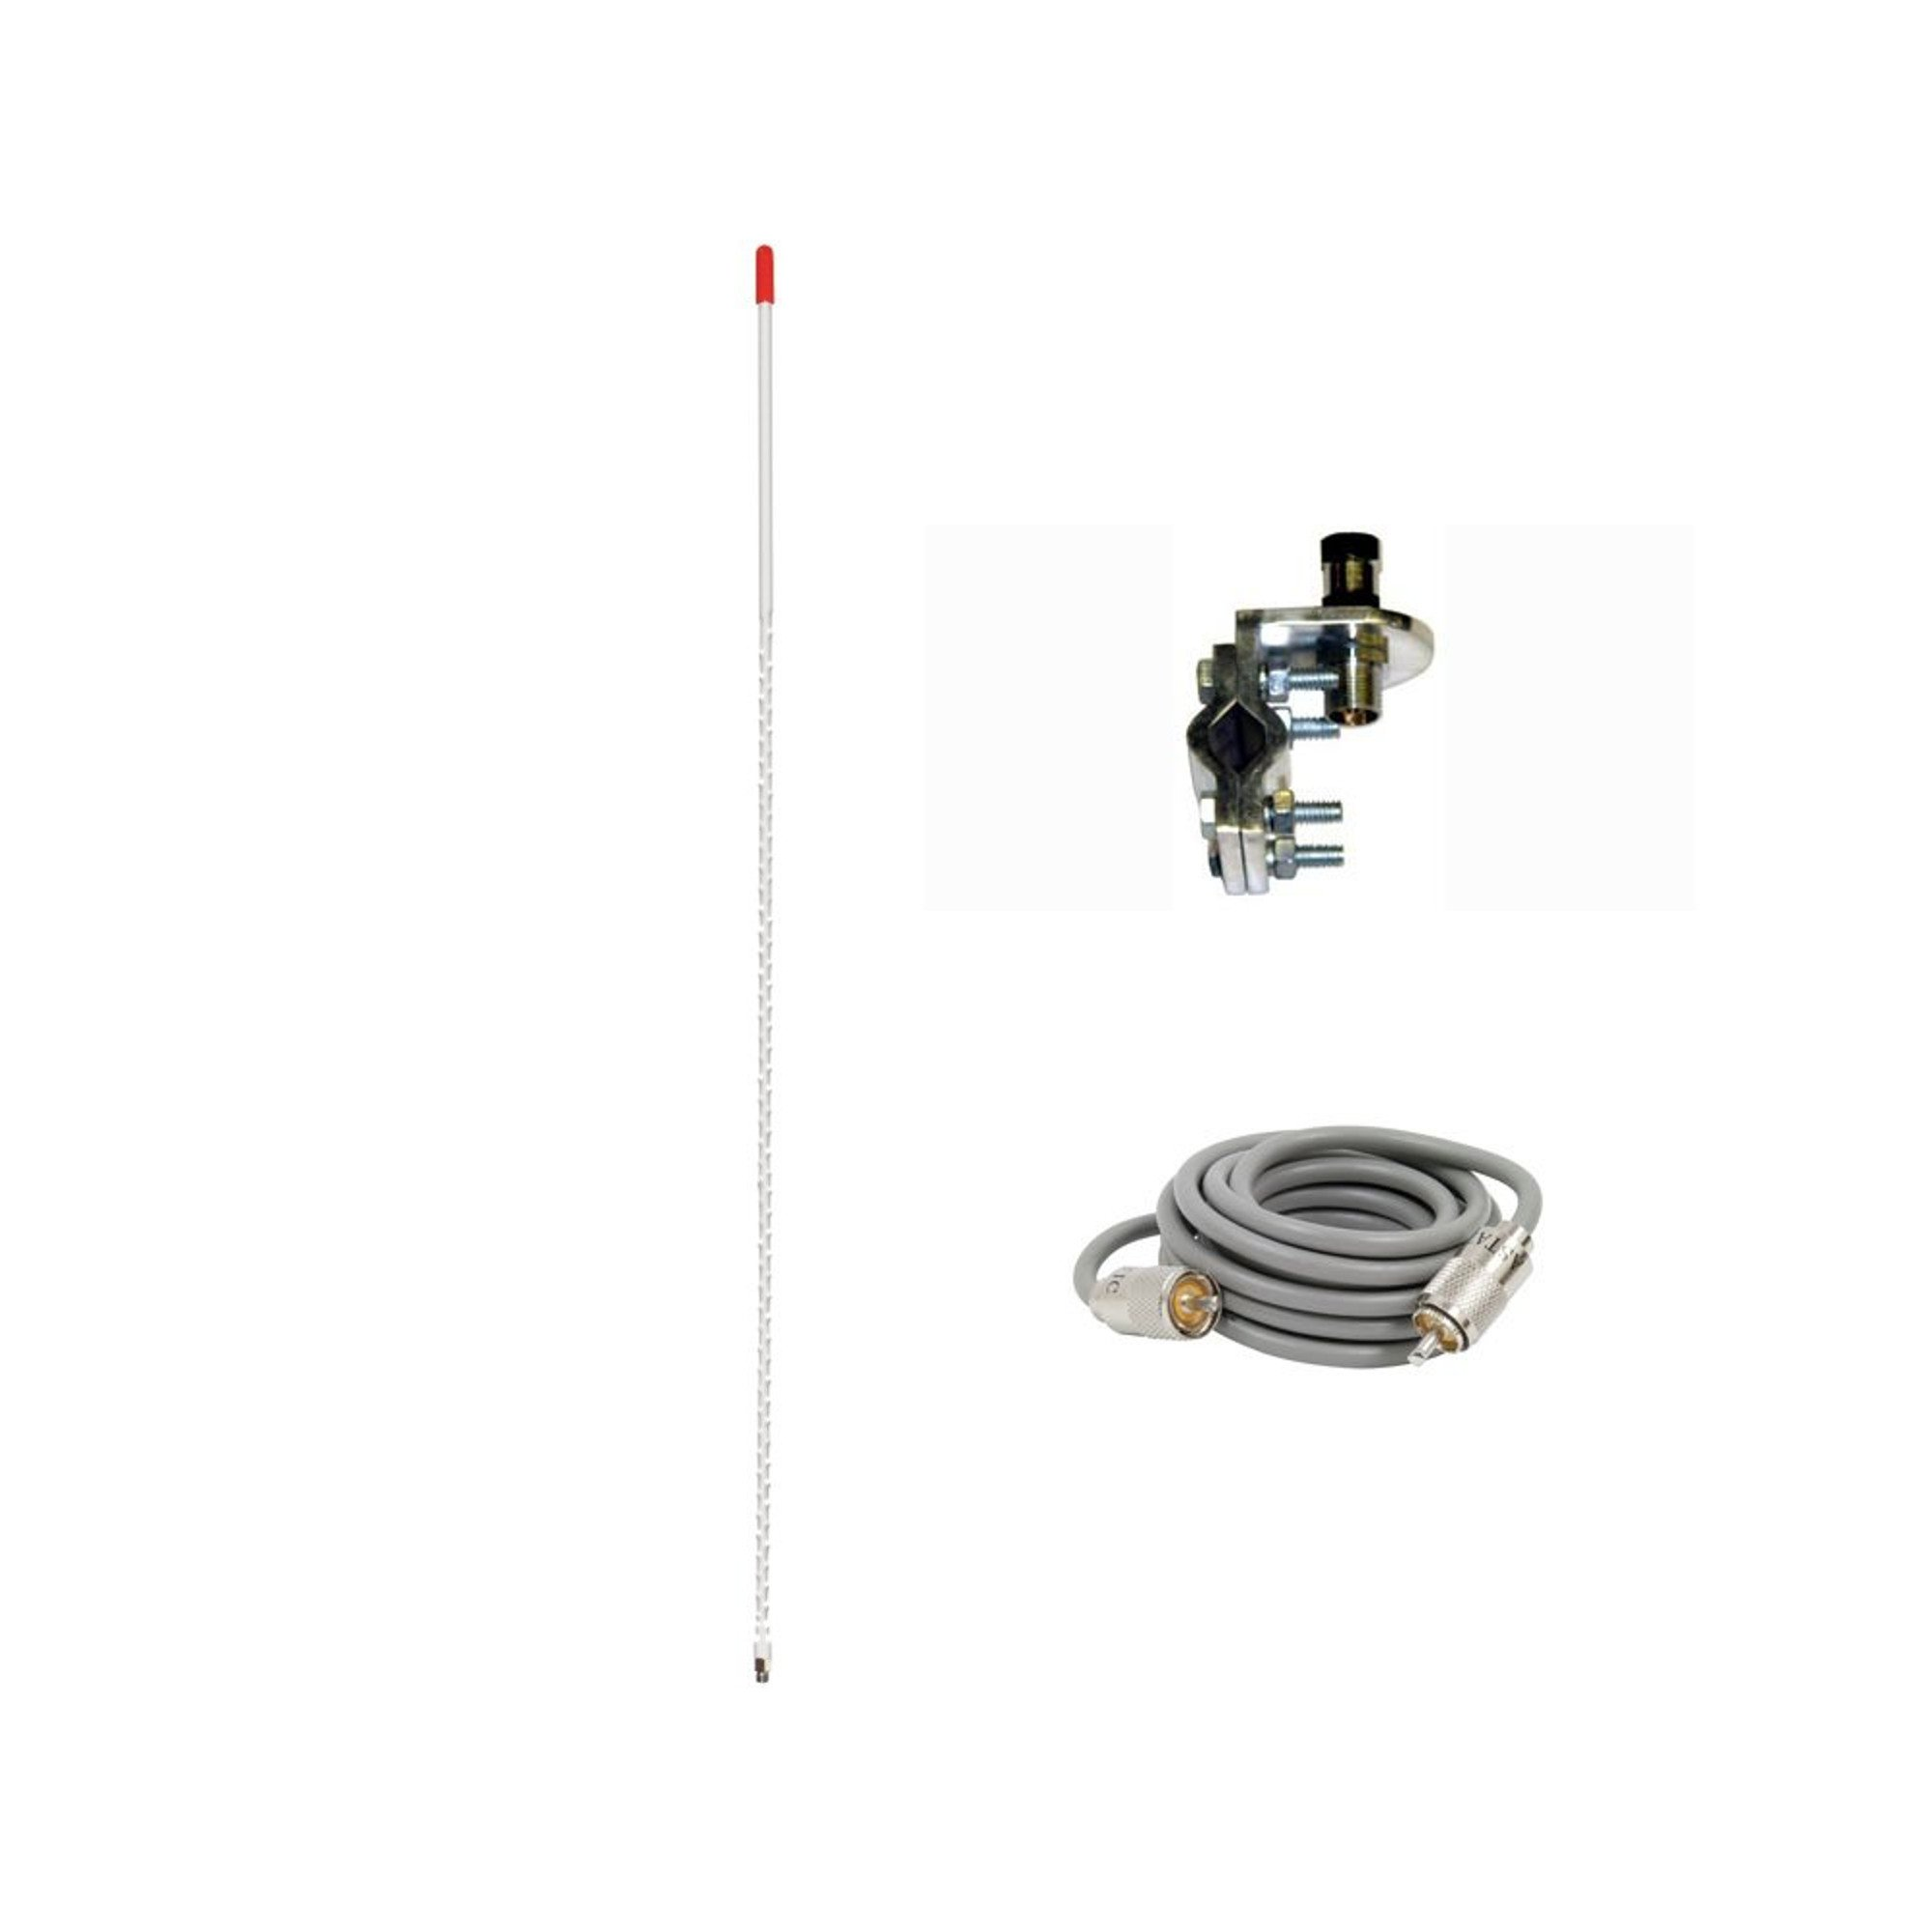 Pro Trucker Single 4' 1,000 Watt CB Radio Antenna Kit With Mirror Mount, Antenna Stud and 9' Coax Cable - White